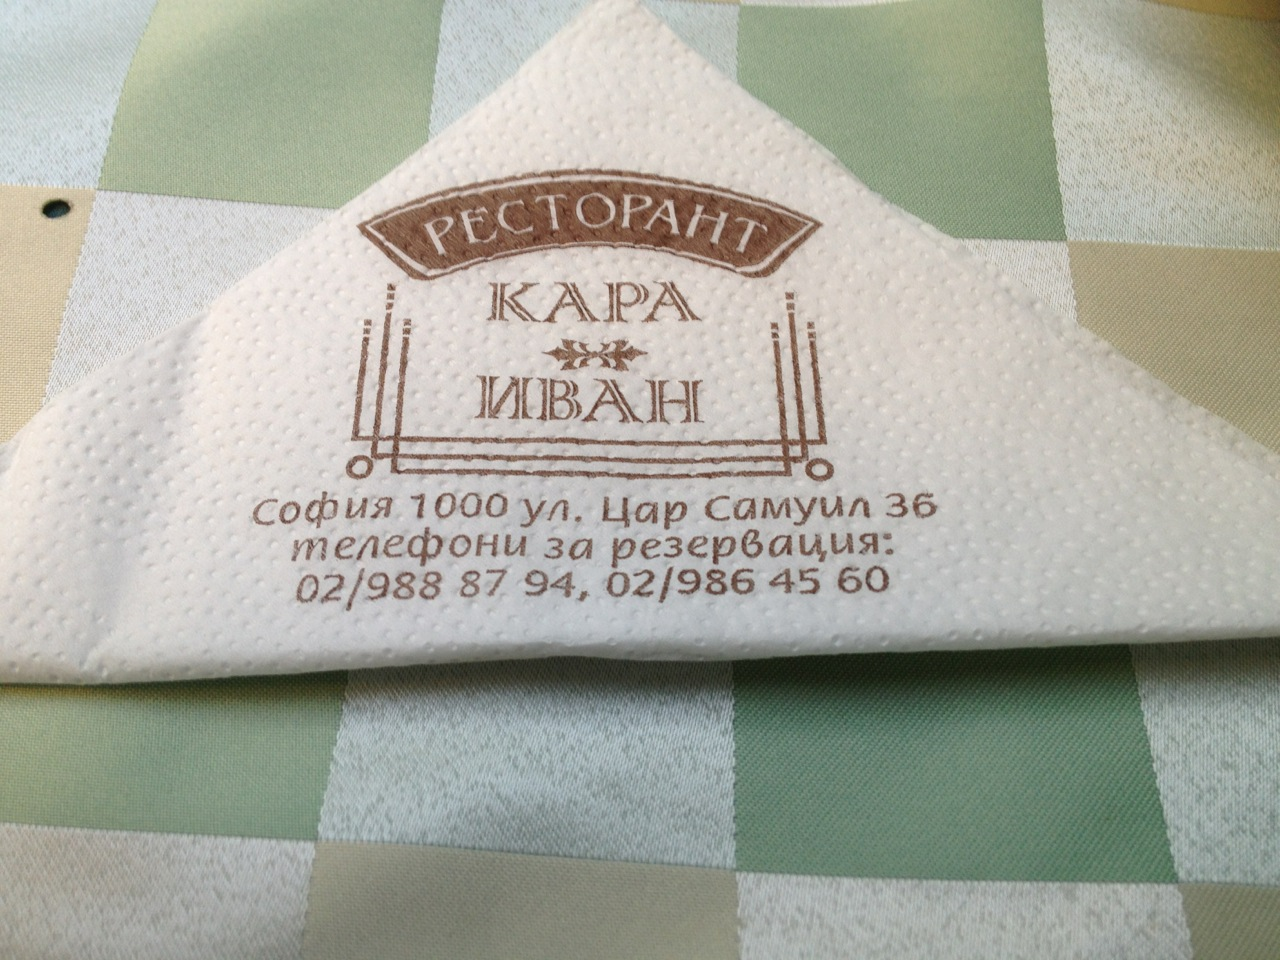 Kara Ivan Restaurant